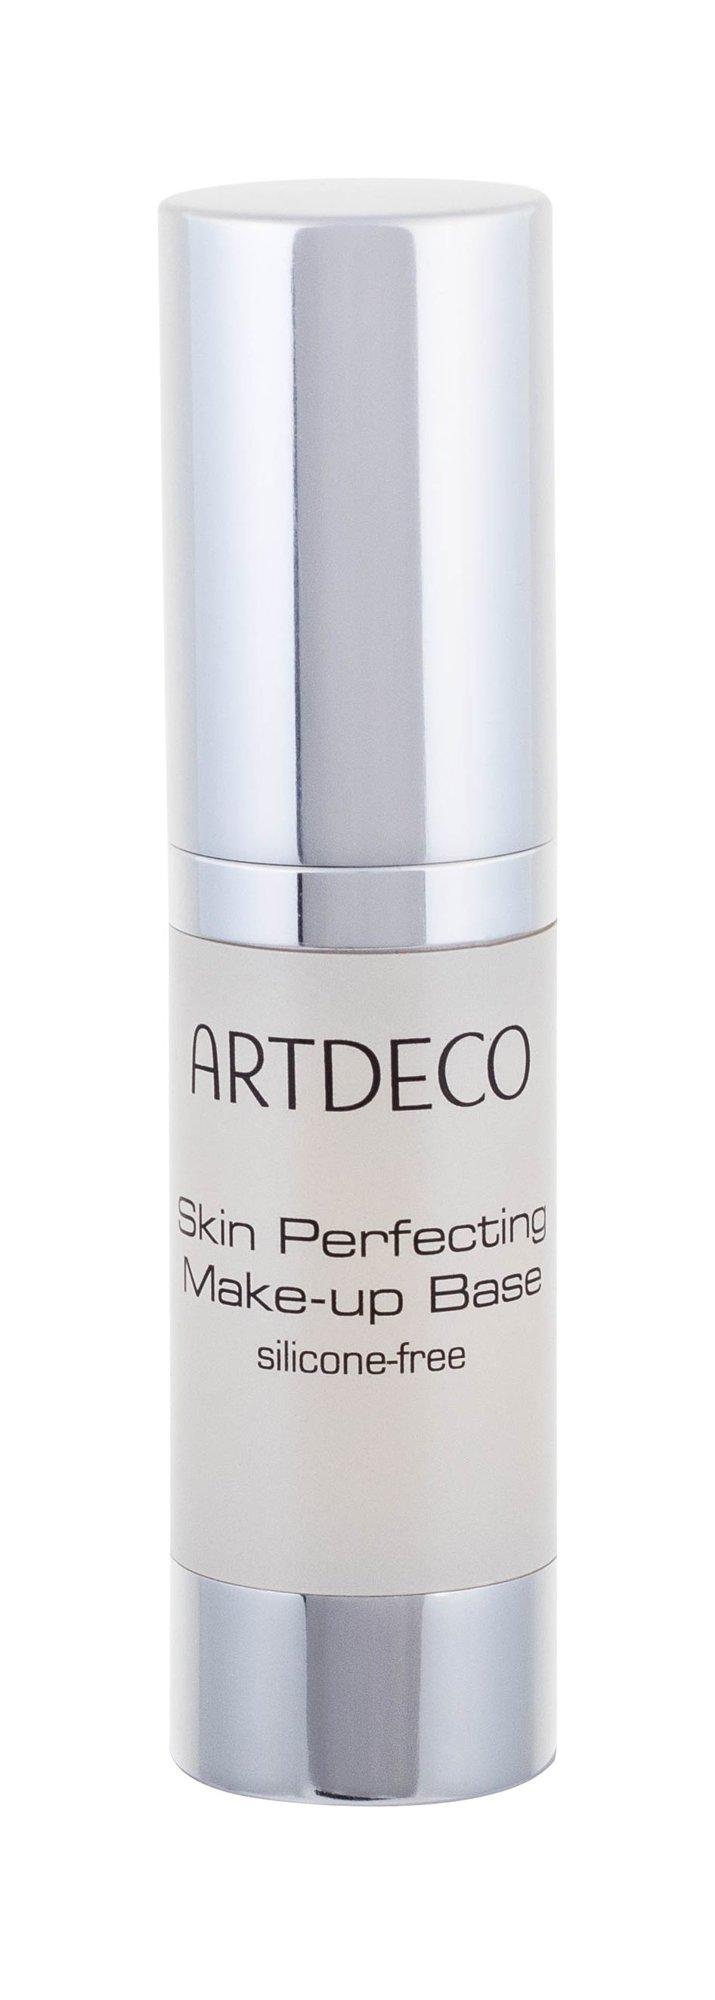 Artdeco Skin Perfecting Makeup Primer 15ml